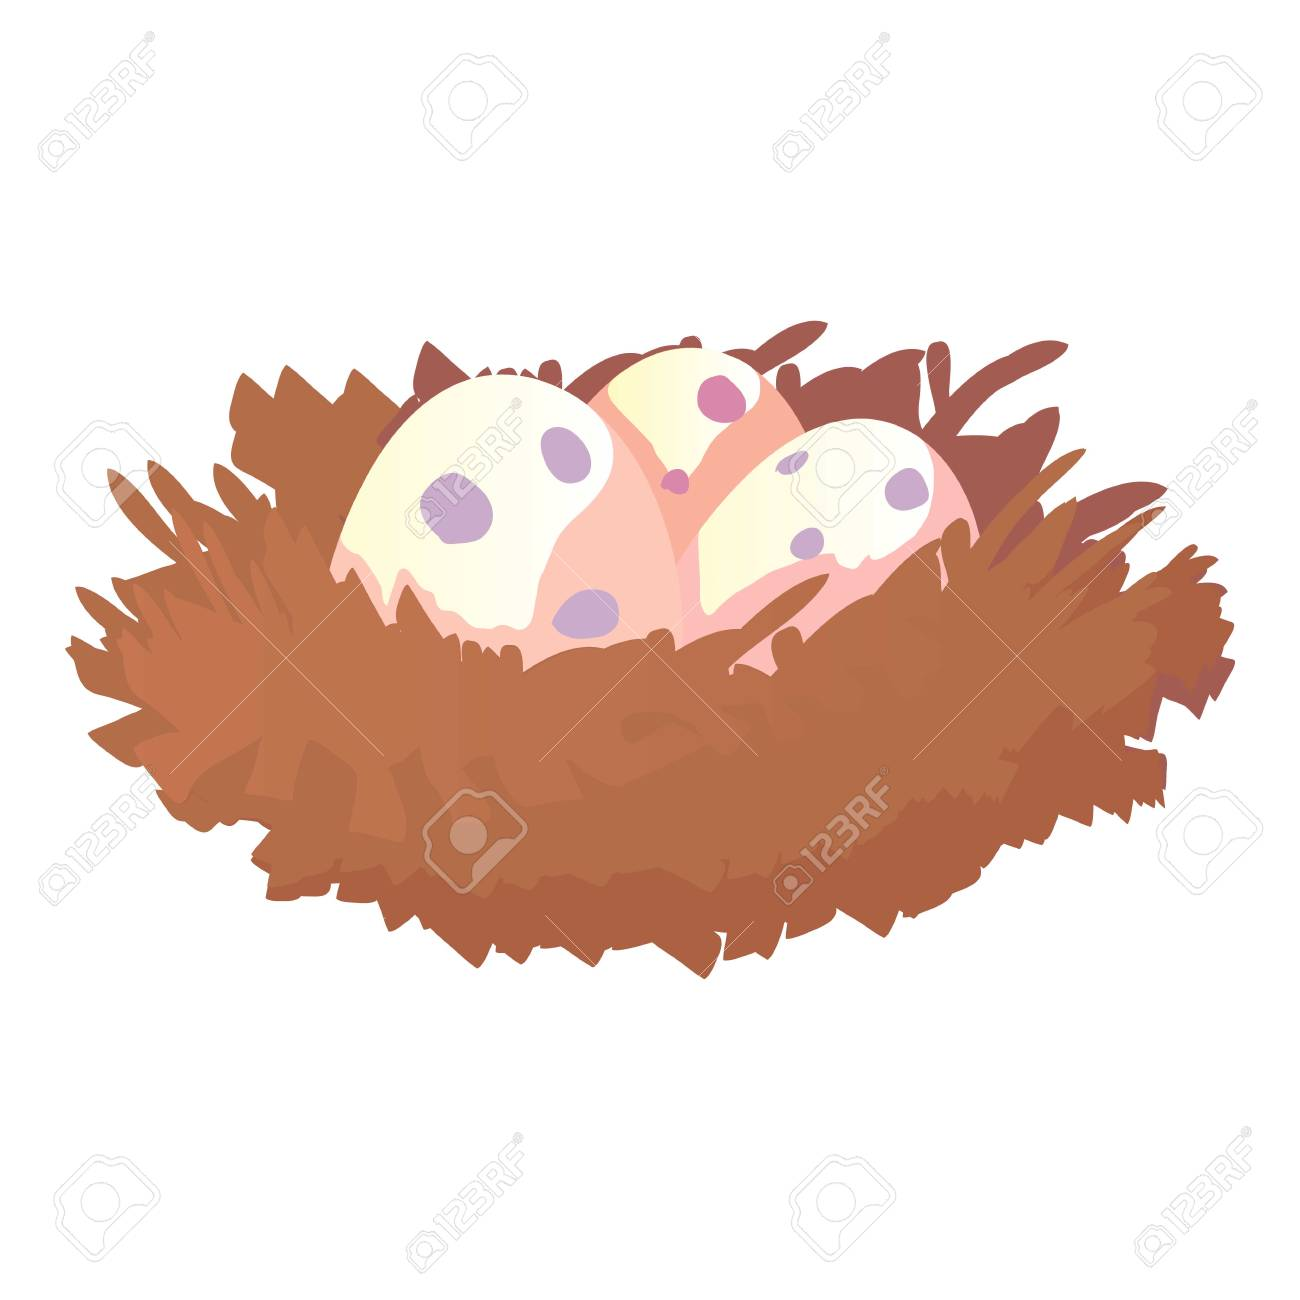 Huevos Animados Interesting Mtenle Ms Caliente Huevo Perezoso